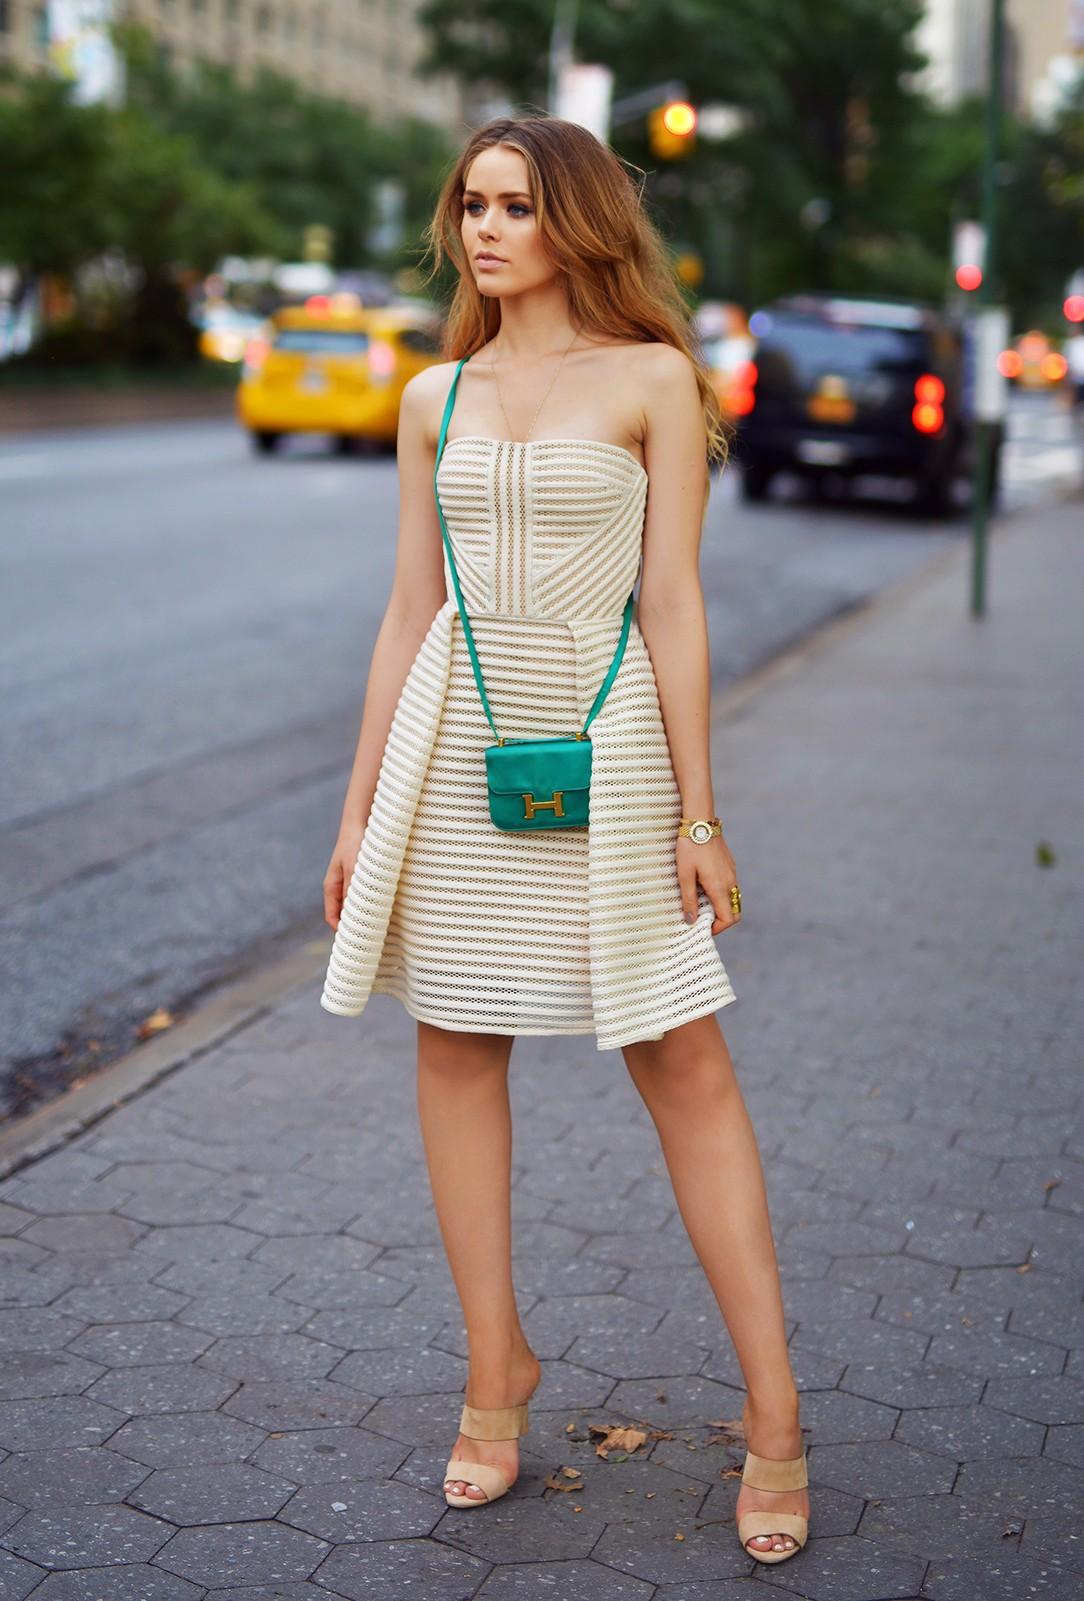 1.-nude-tube-dress-with-cute-clutch-e1452324542353.jpg